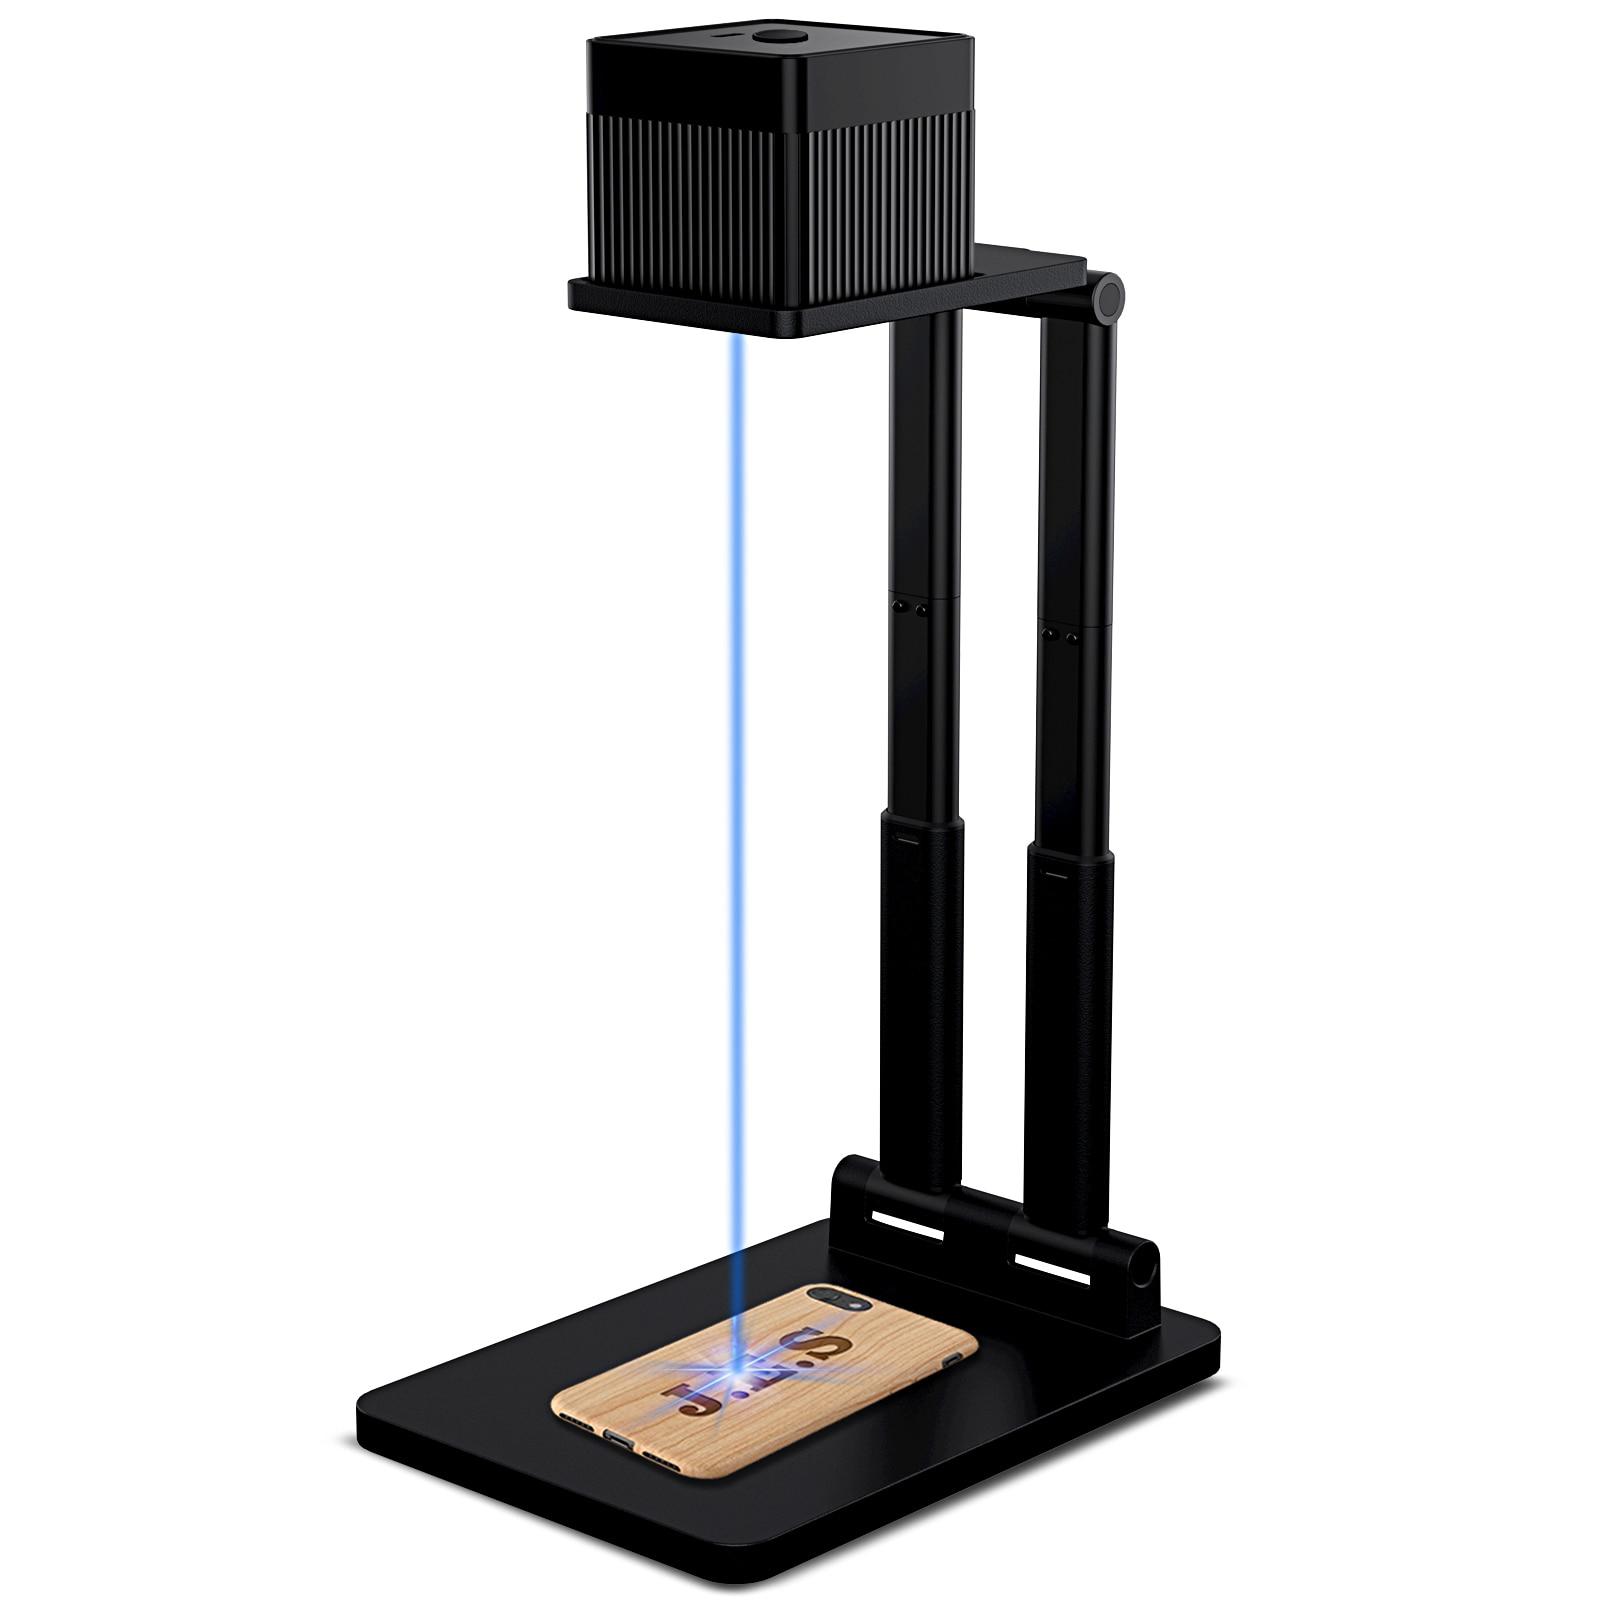 NEW LC100 Laser Engraver 3D Printer Engraving Machine Desktop Etcher Cutter Engraver with Bracket Portable With Bluetooth